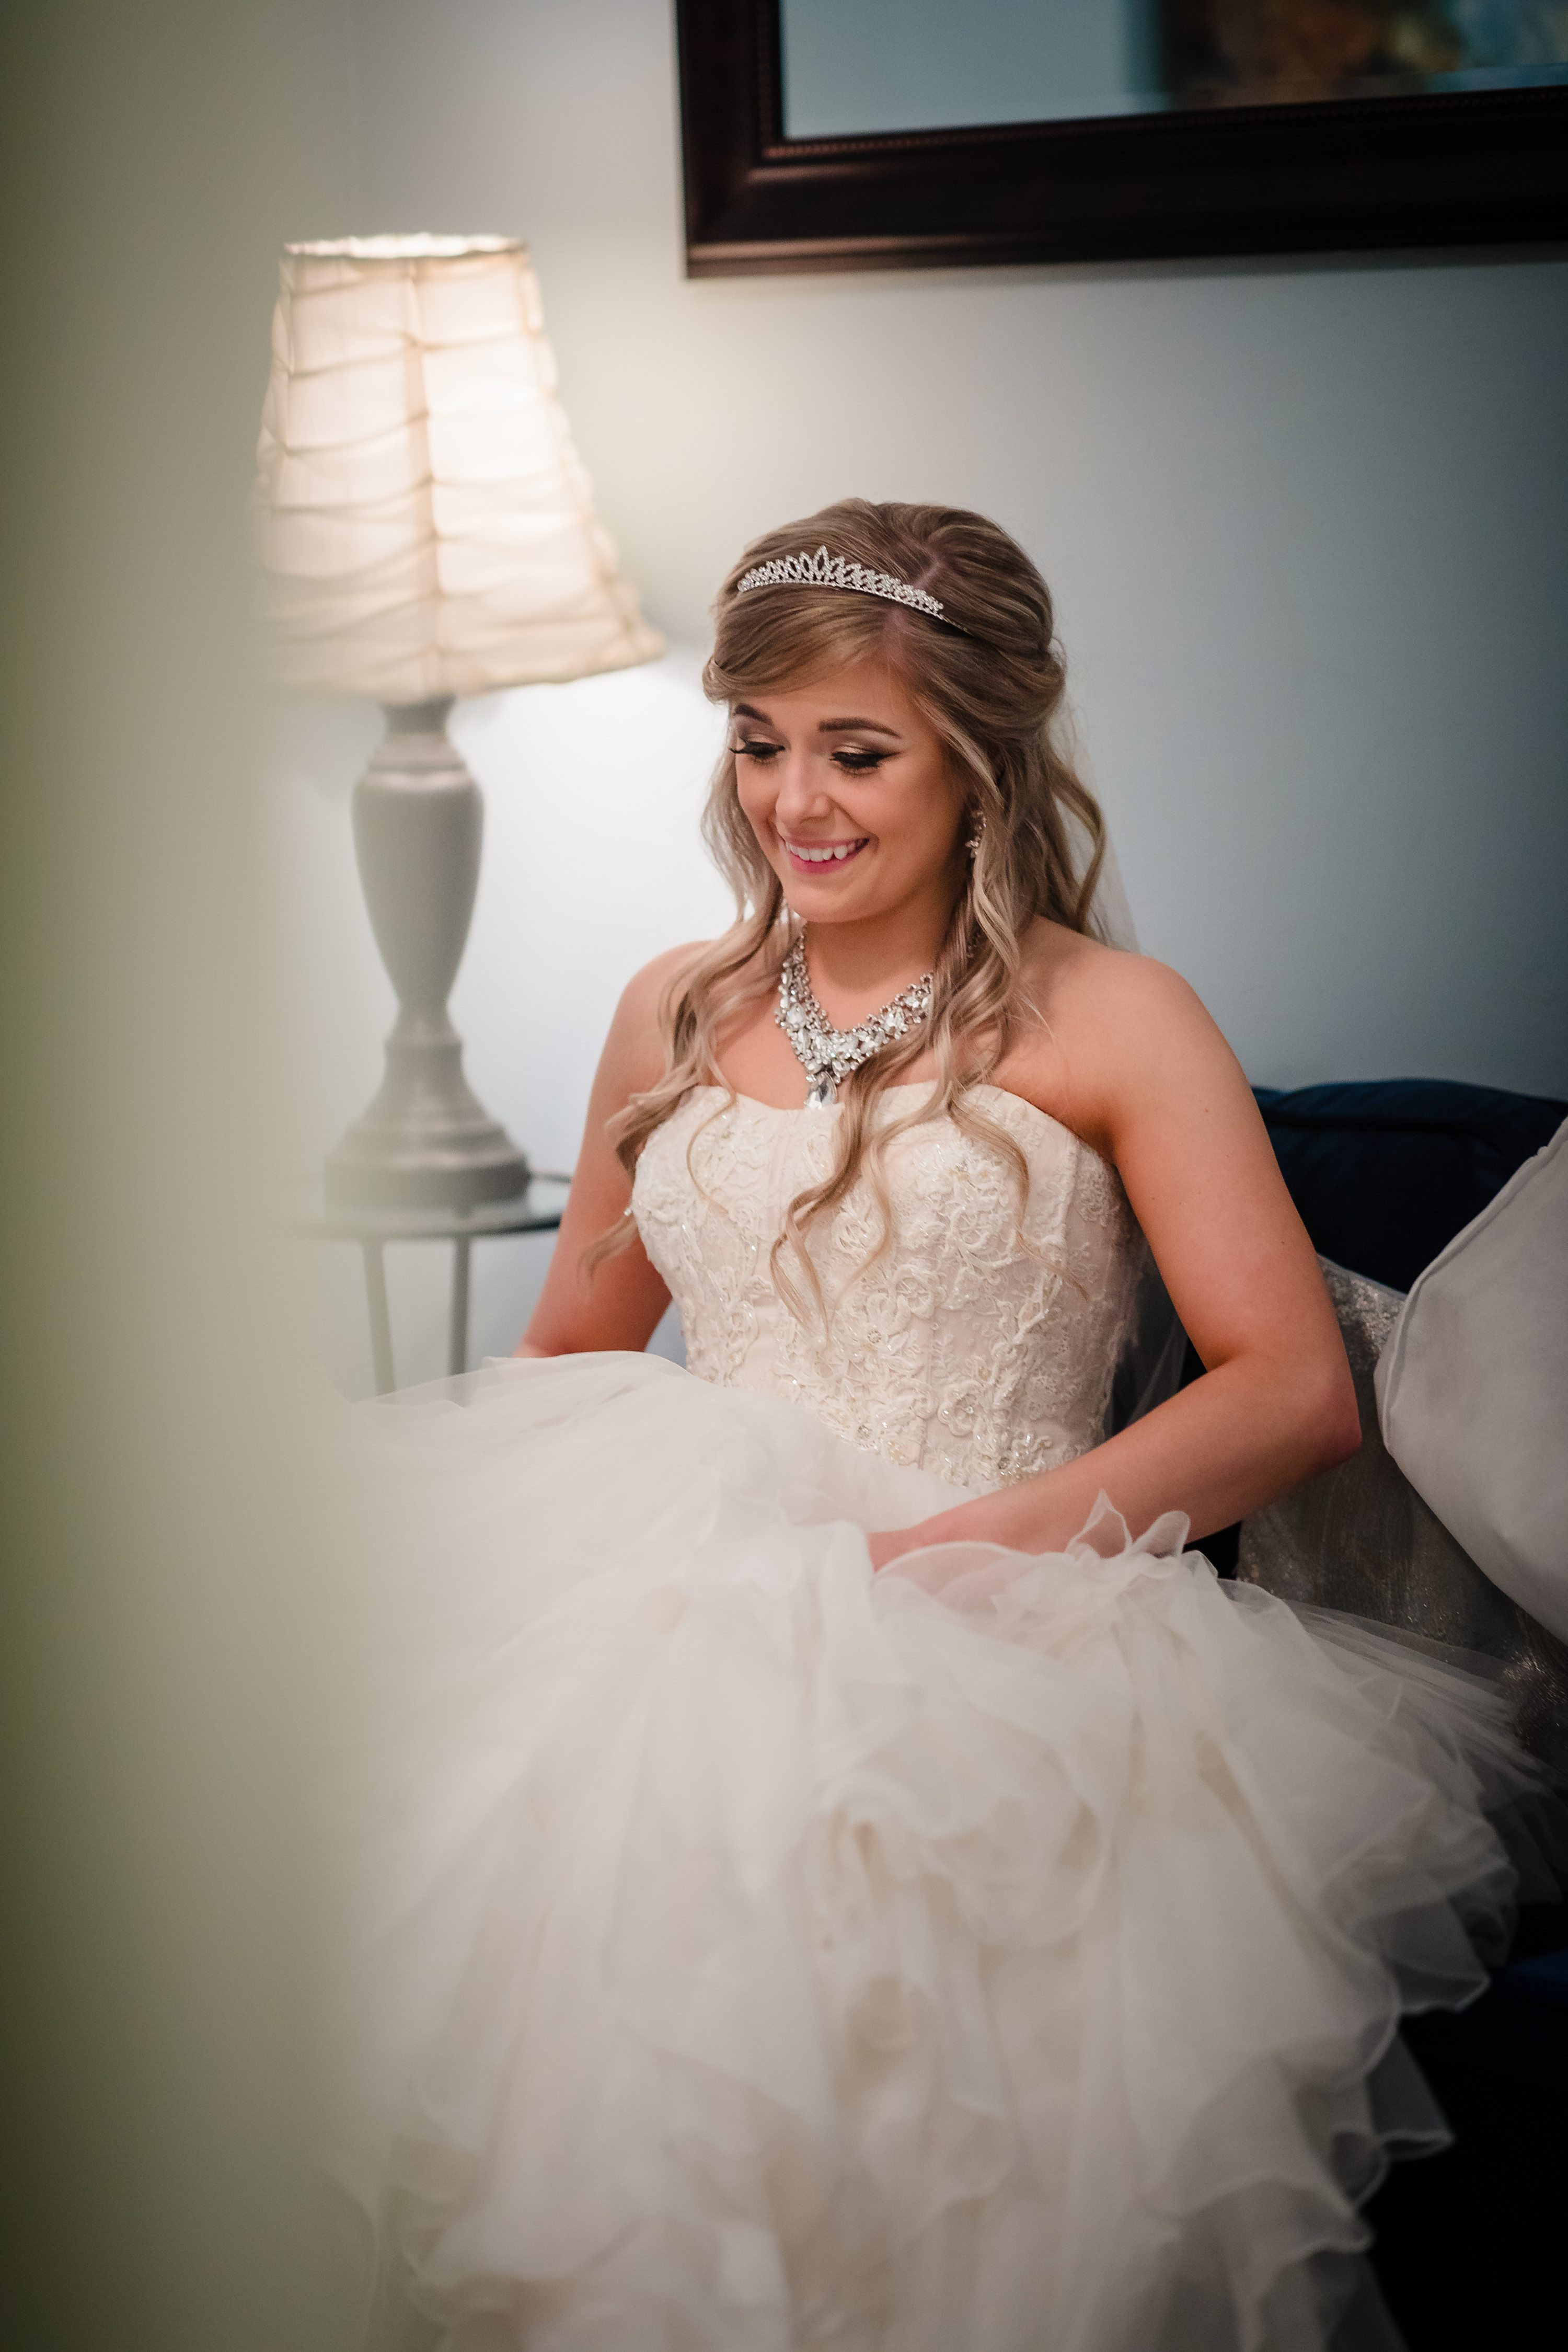 louisiana wedding photographer, Baton Rouge wedding photographer